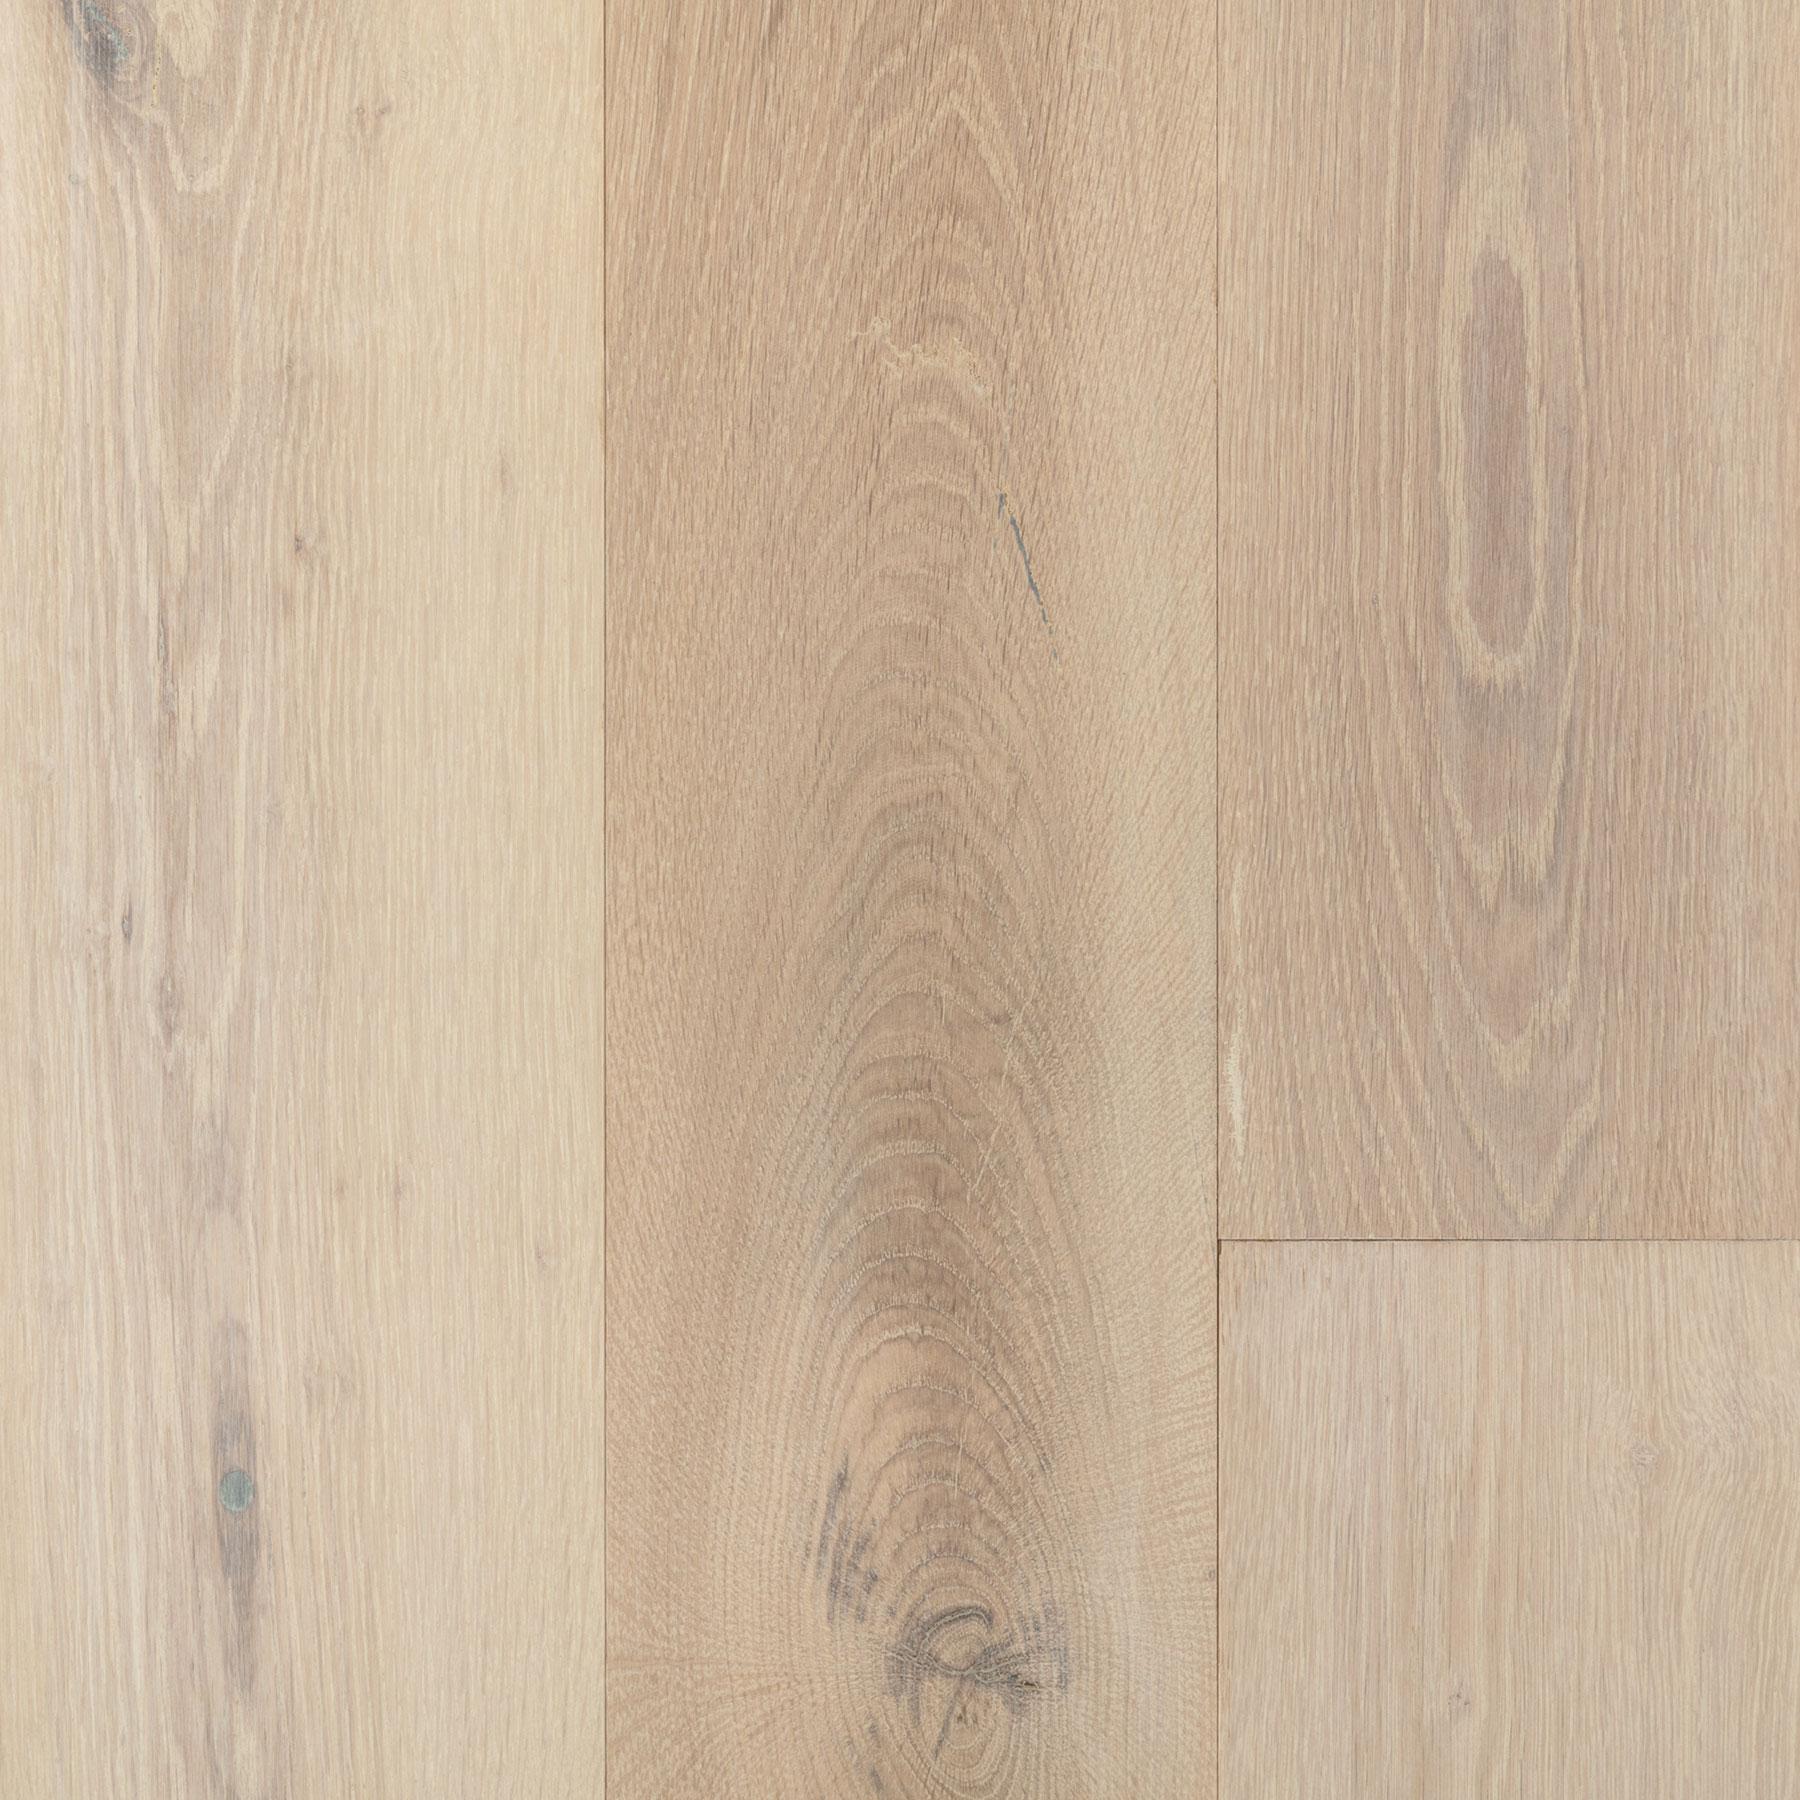 Tesoro Woods White Oak Wood Flooring Coastal Lowlands Bungalow